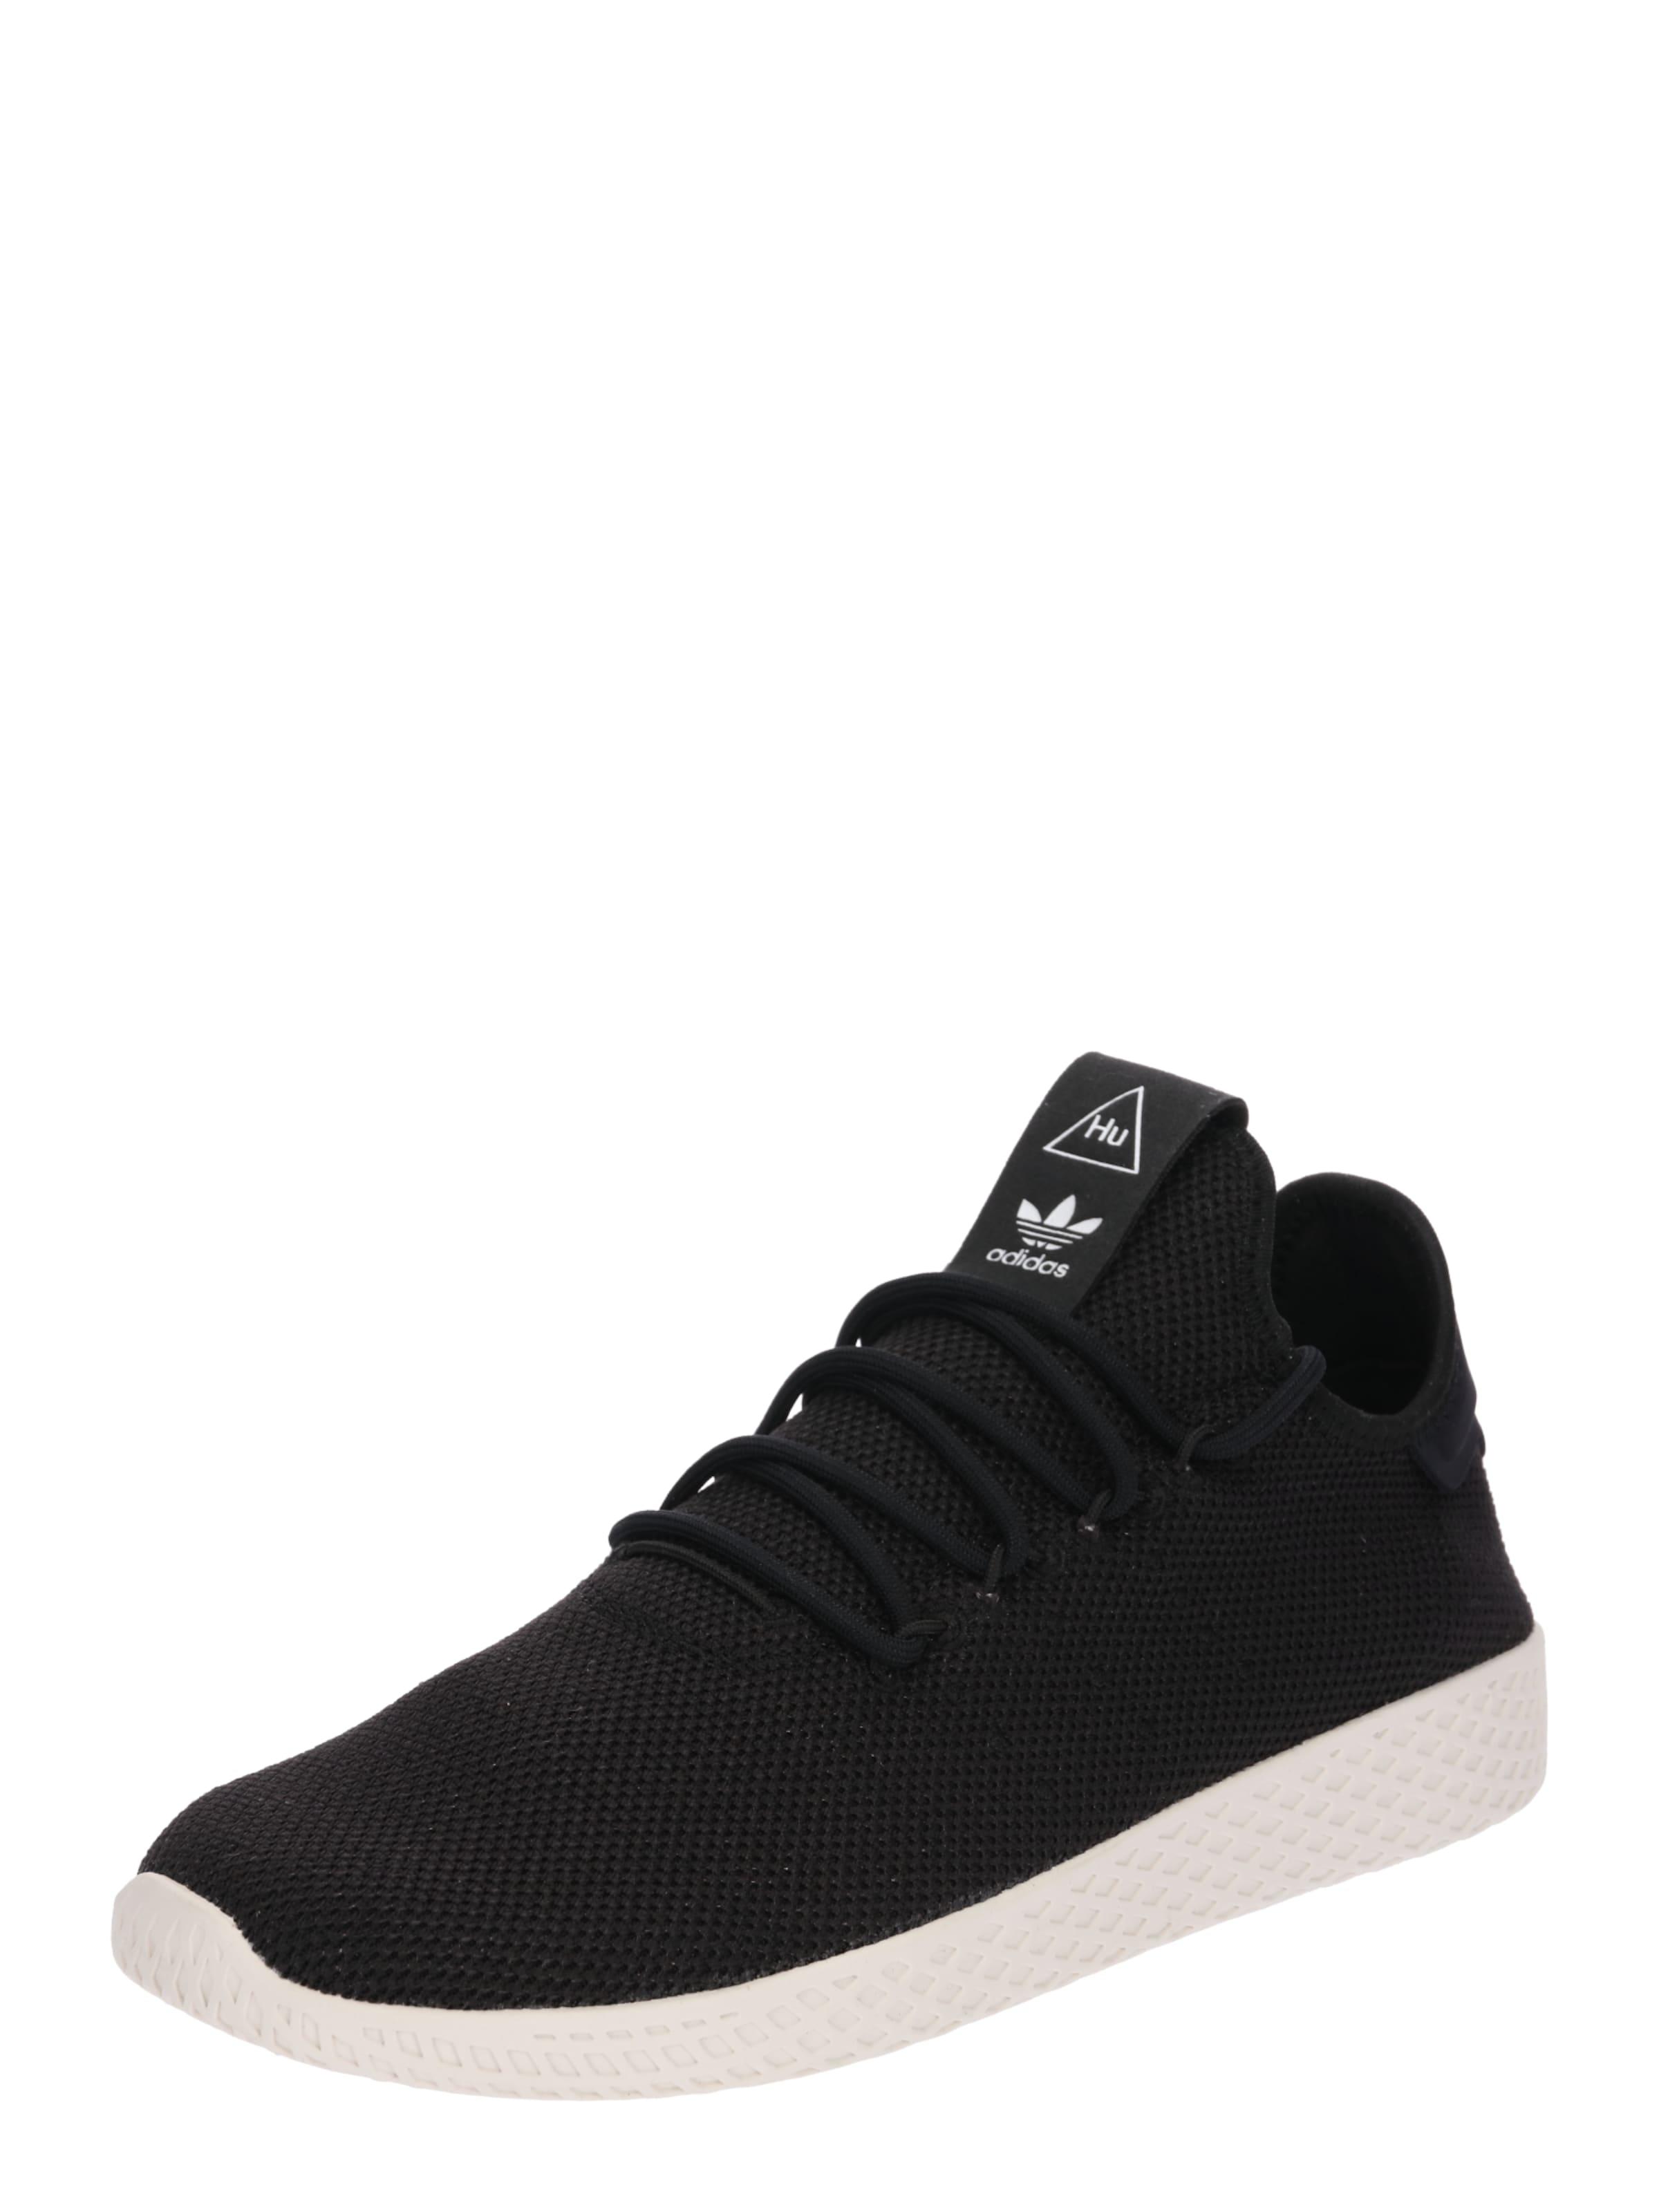 ADIDAS ORIGINALS Sneaker  PW HU